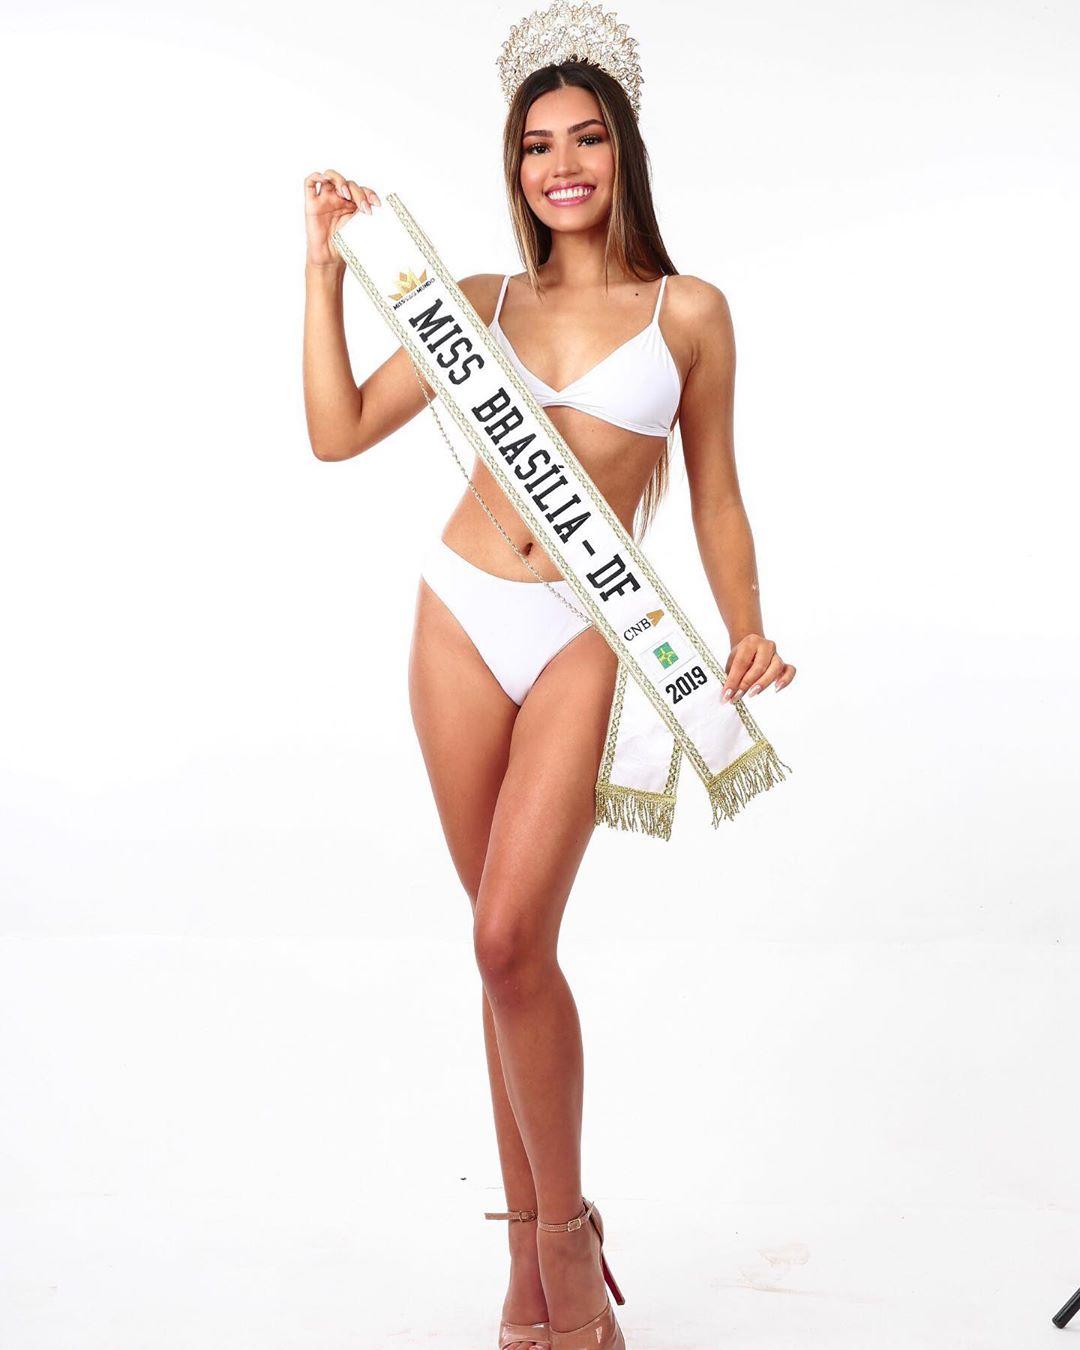 maiza santa rita, top 10 de miss brasil mundo 2019. 67168910